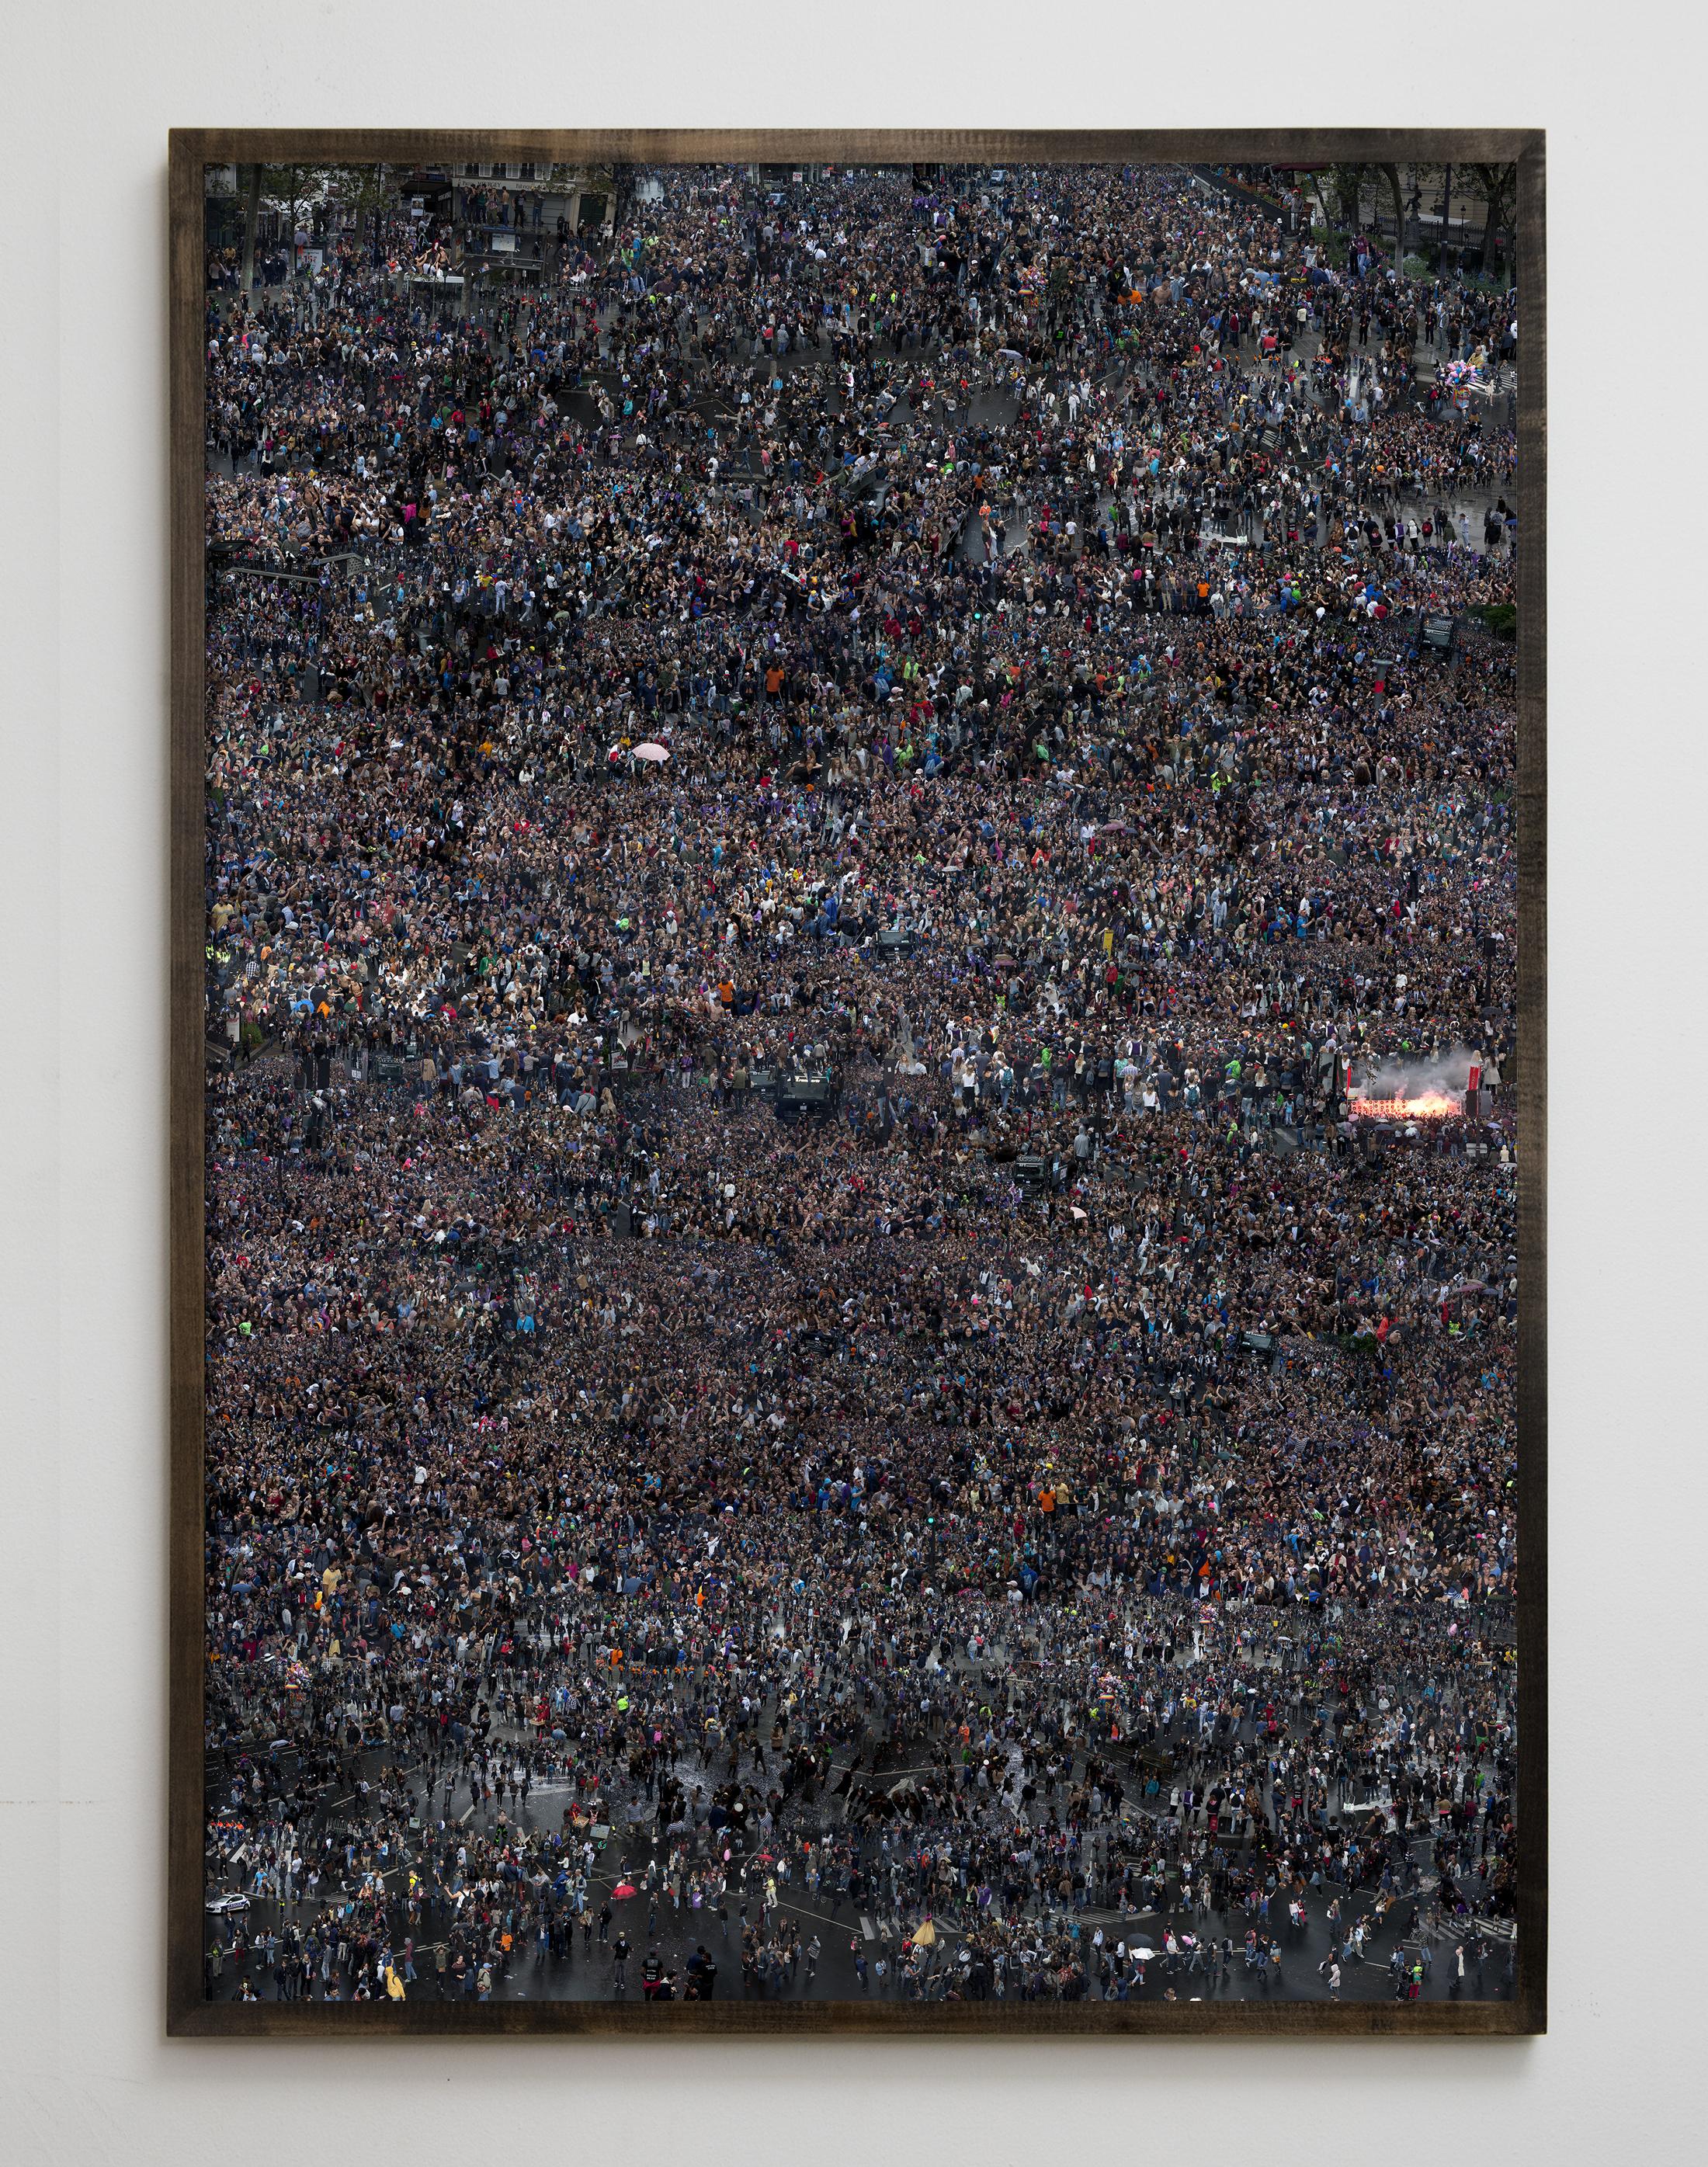 Untitled (Paris). Digital C Print. 71X100 inches